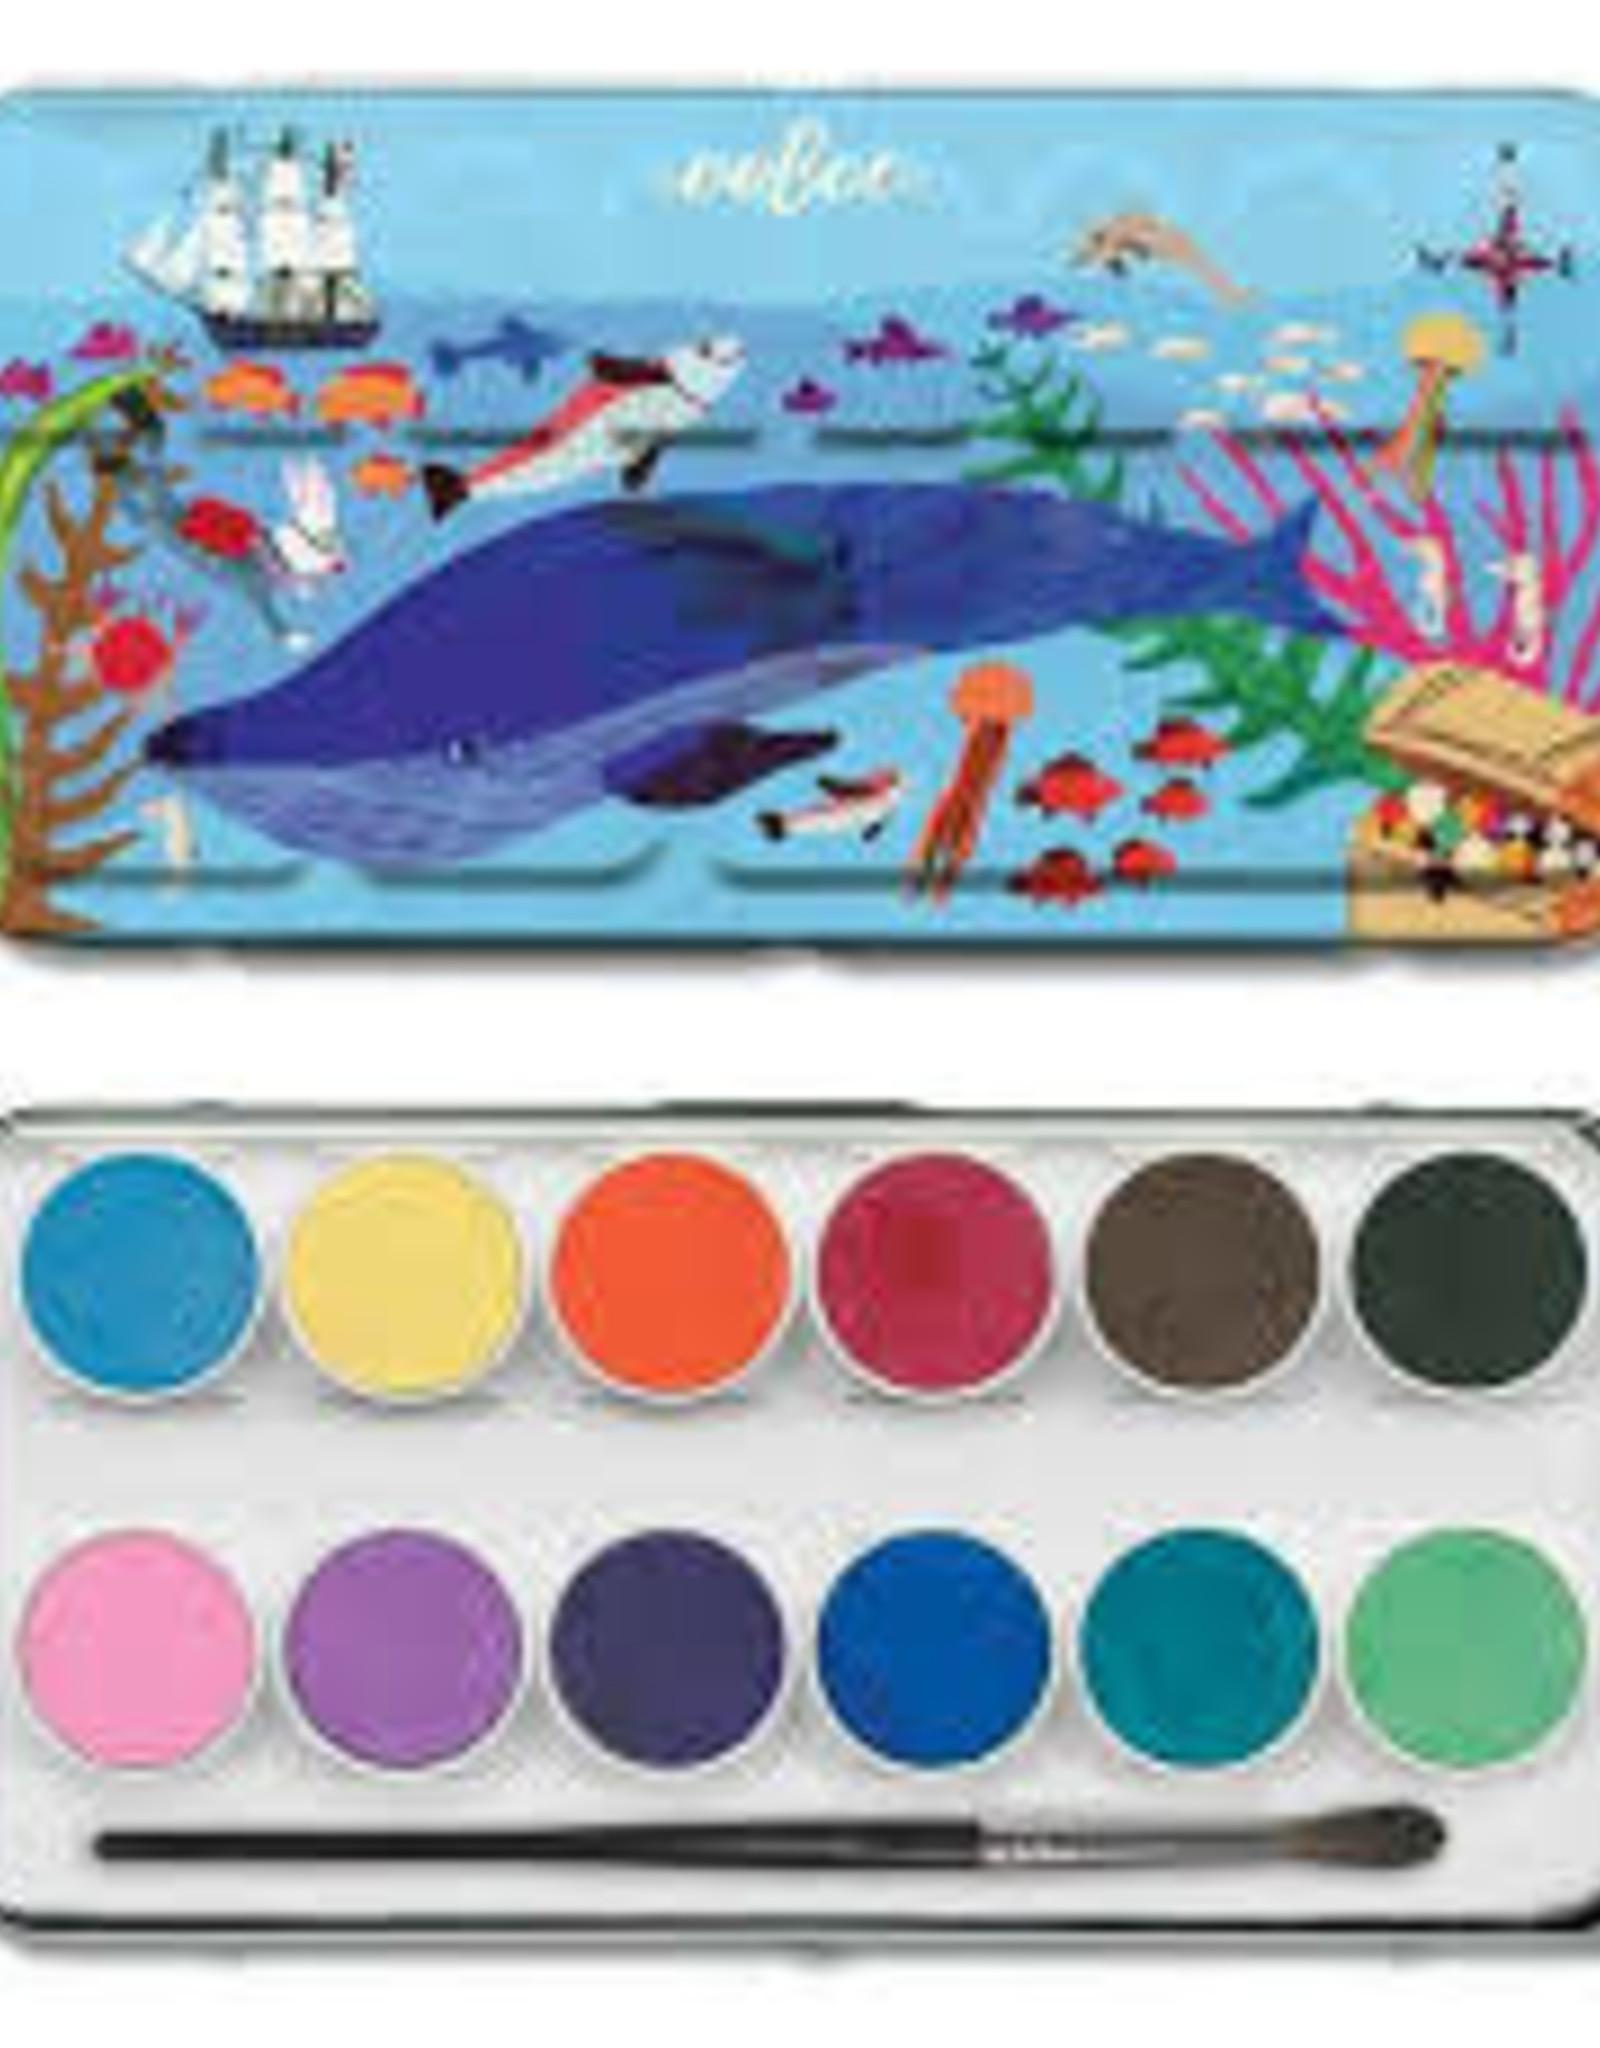 eeBoo In the Sea Watercolors